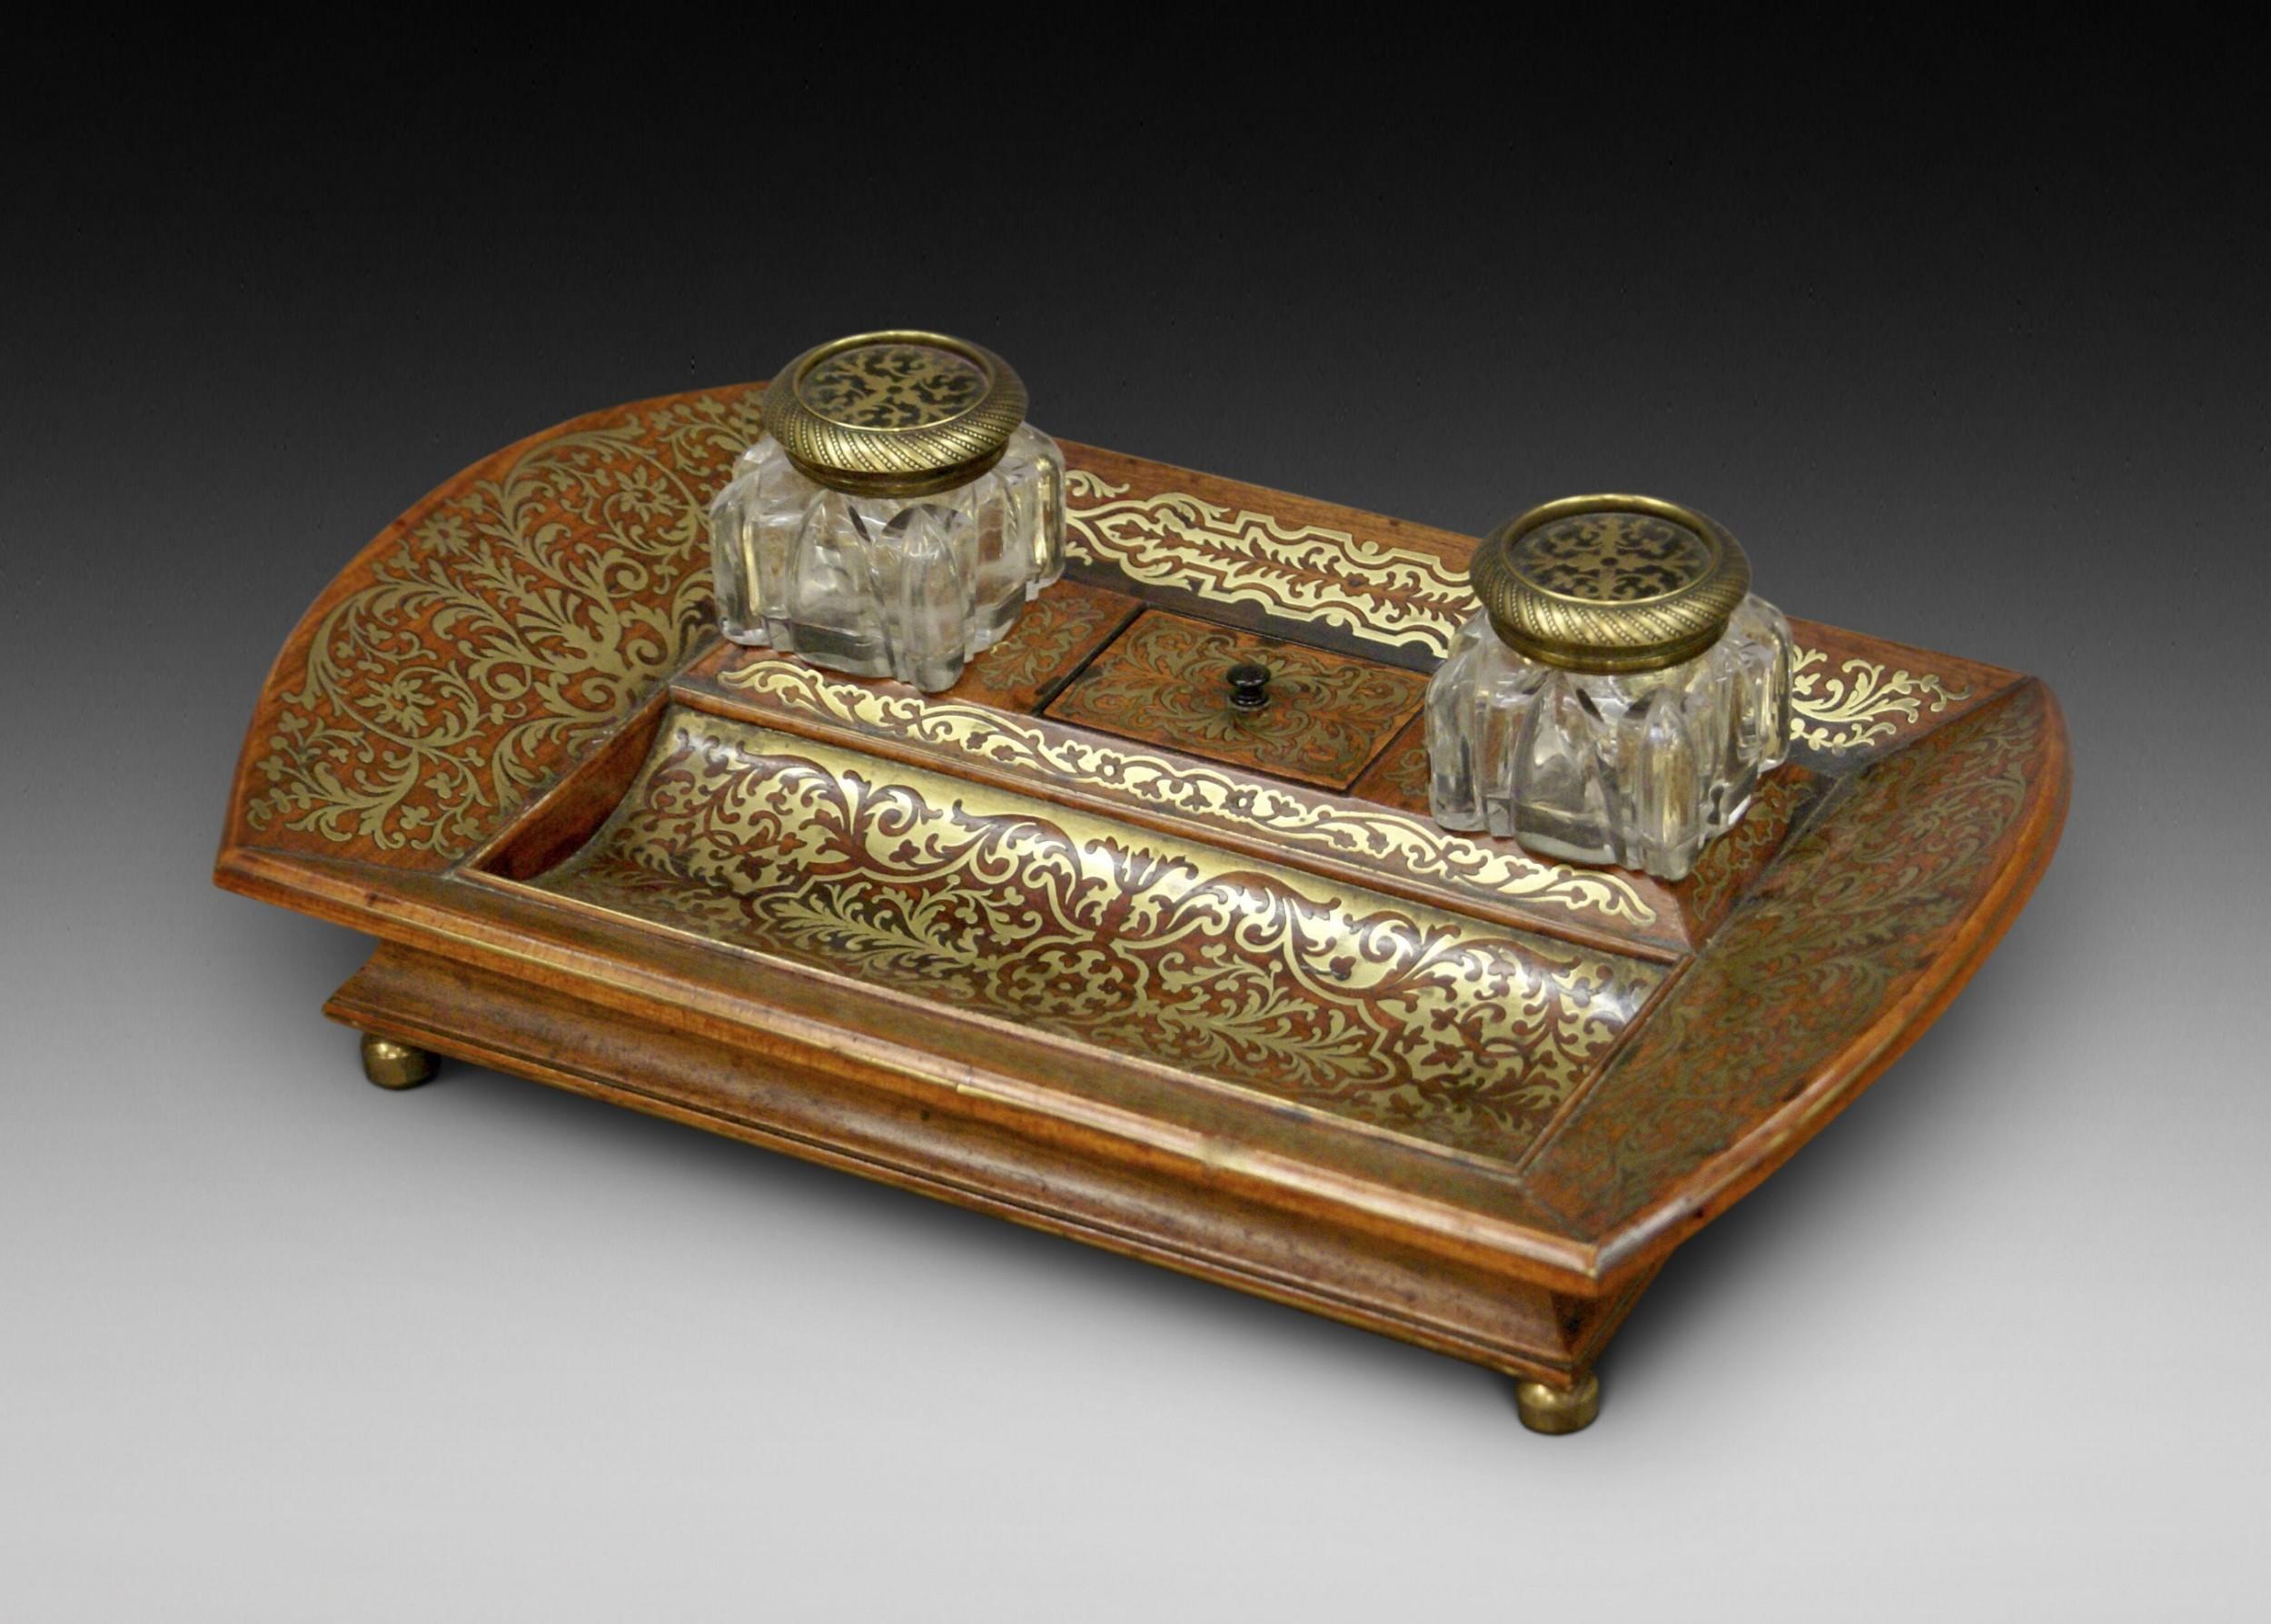 regency rosewood brass inlaid deskinkstand